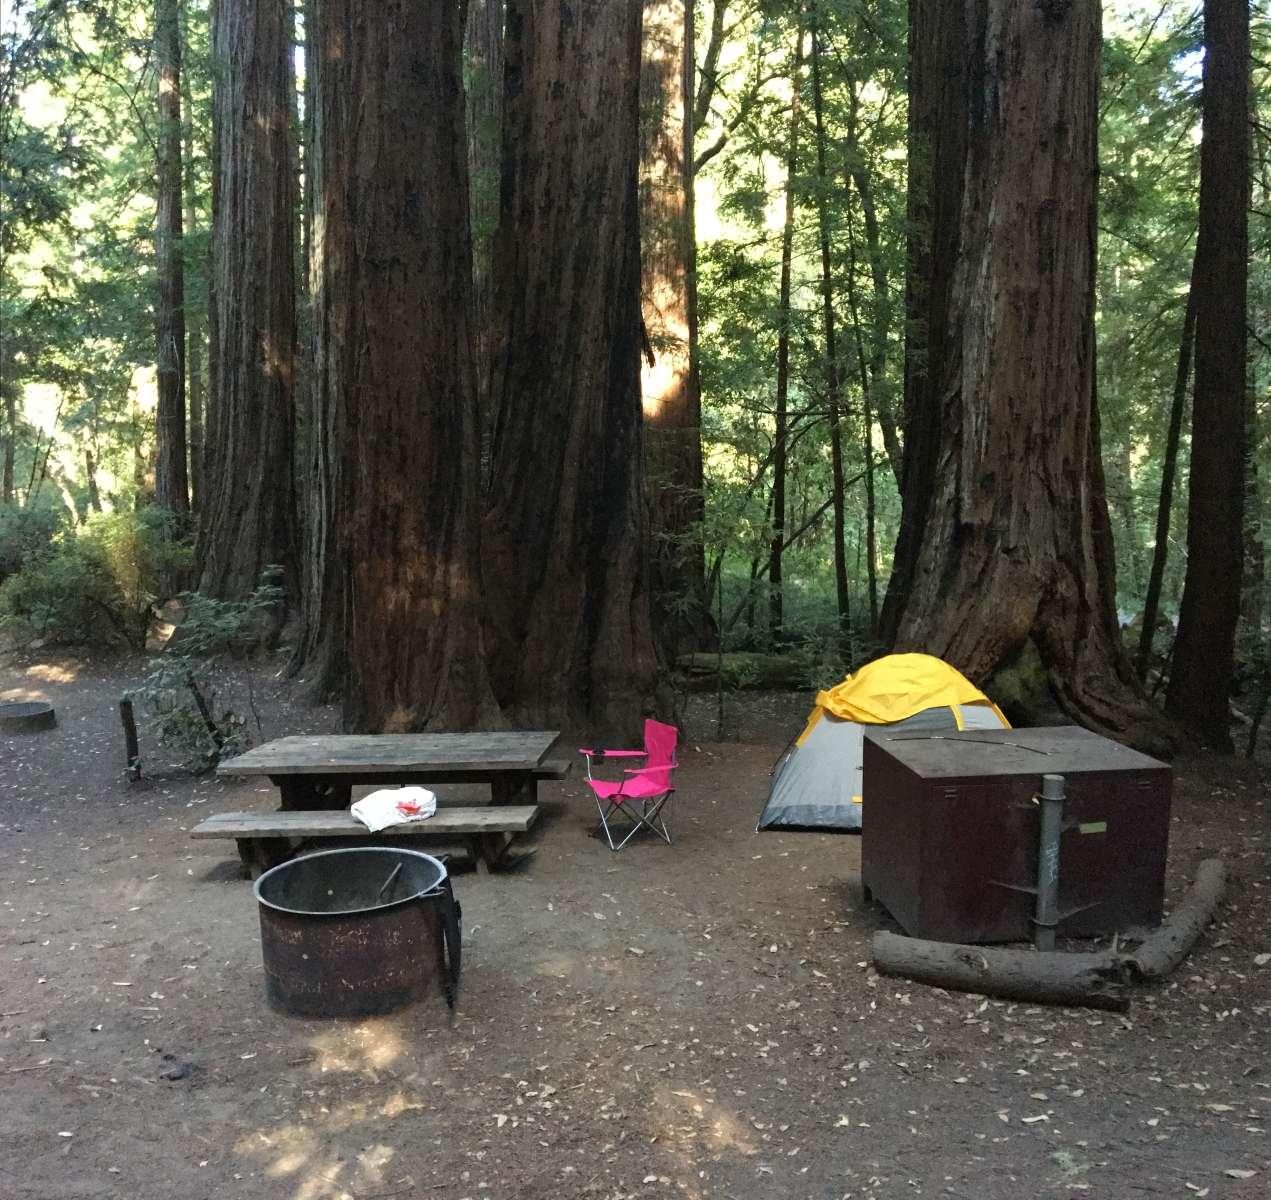 Wastahi Campground, Big Basin Redwoods, CA: 3 Hipcamper ...